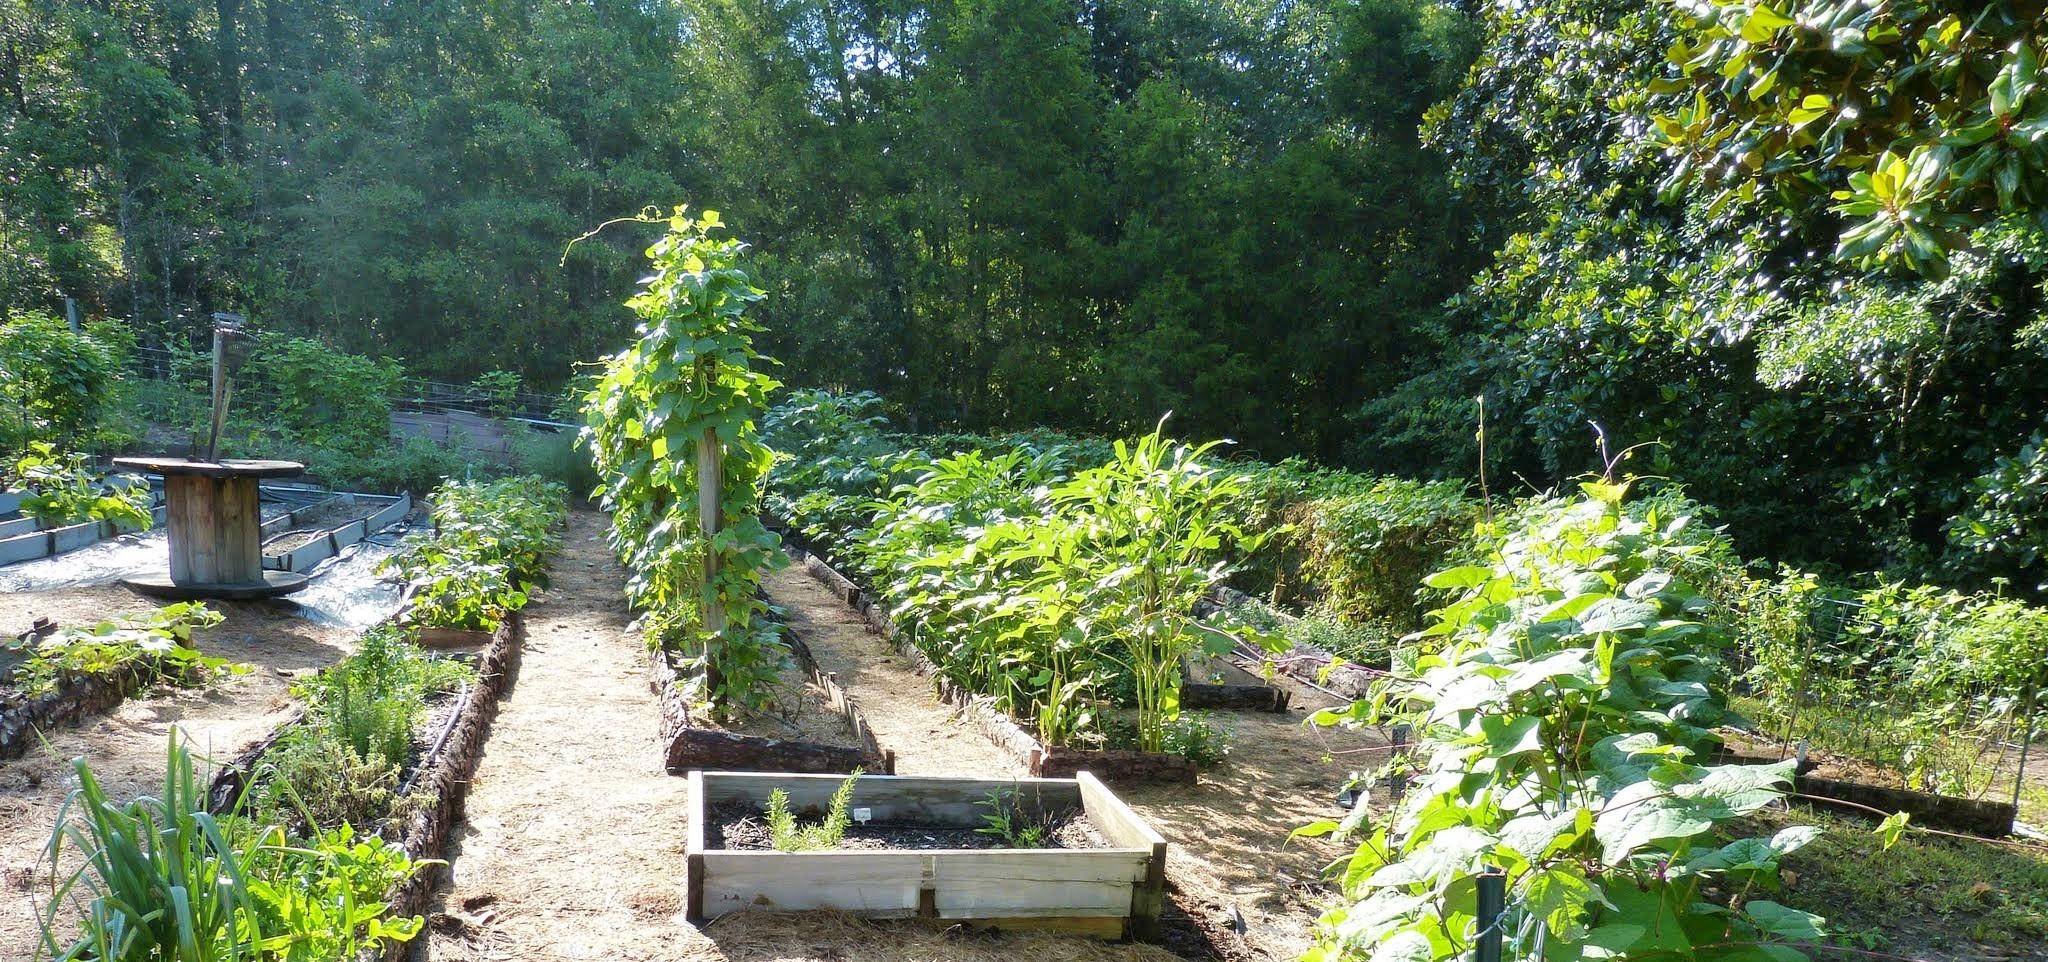 Is My Small Farm Organic?